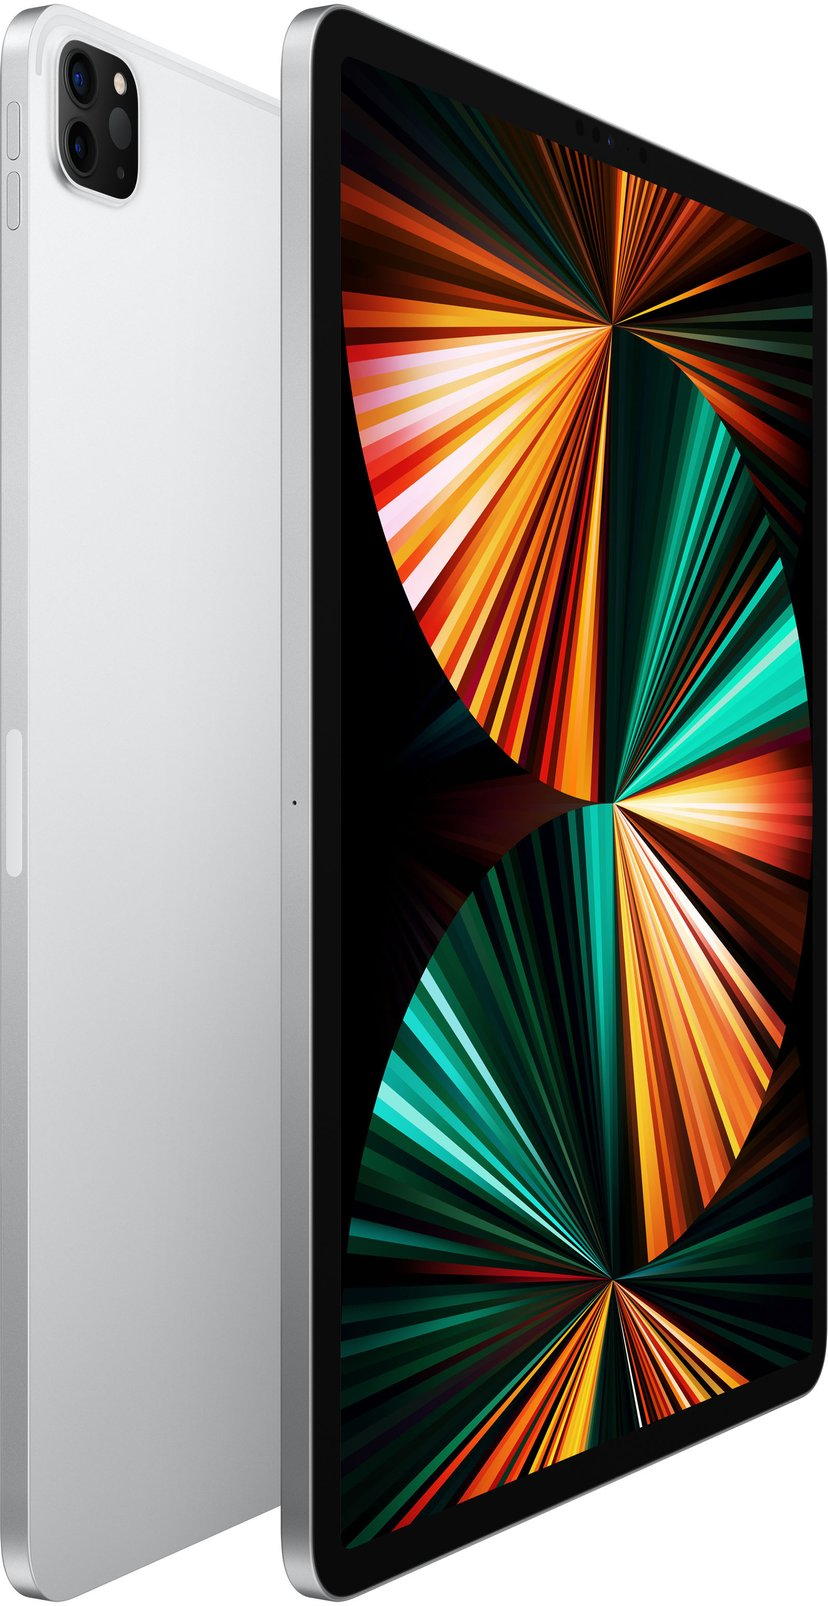 "Apple iPad Pro 12.9' Wi-Fi (2021) 12.9"" M1 256GB Silver"